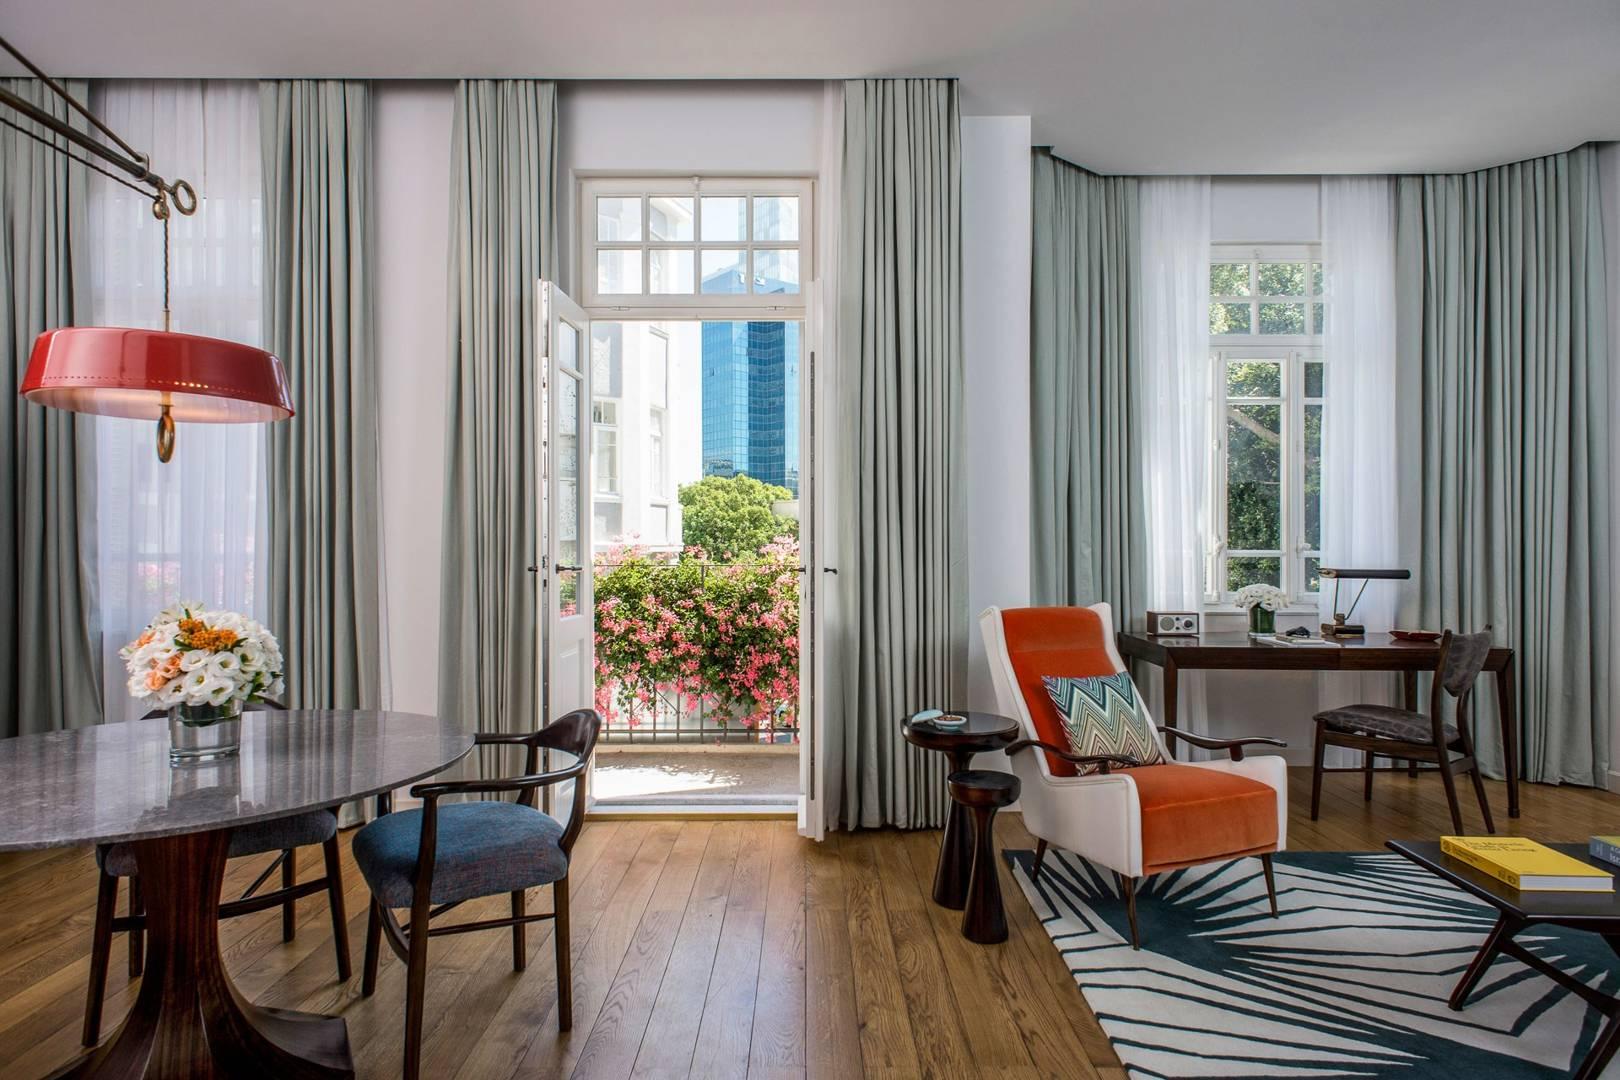 The world's best new hotels | The Hot List 2015 | CN Traveller